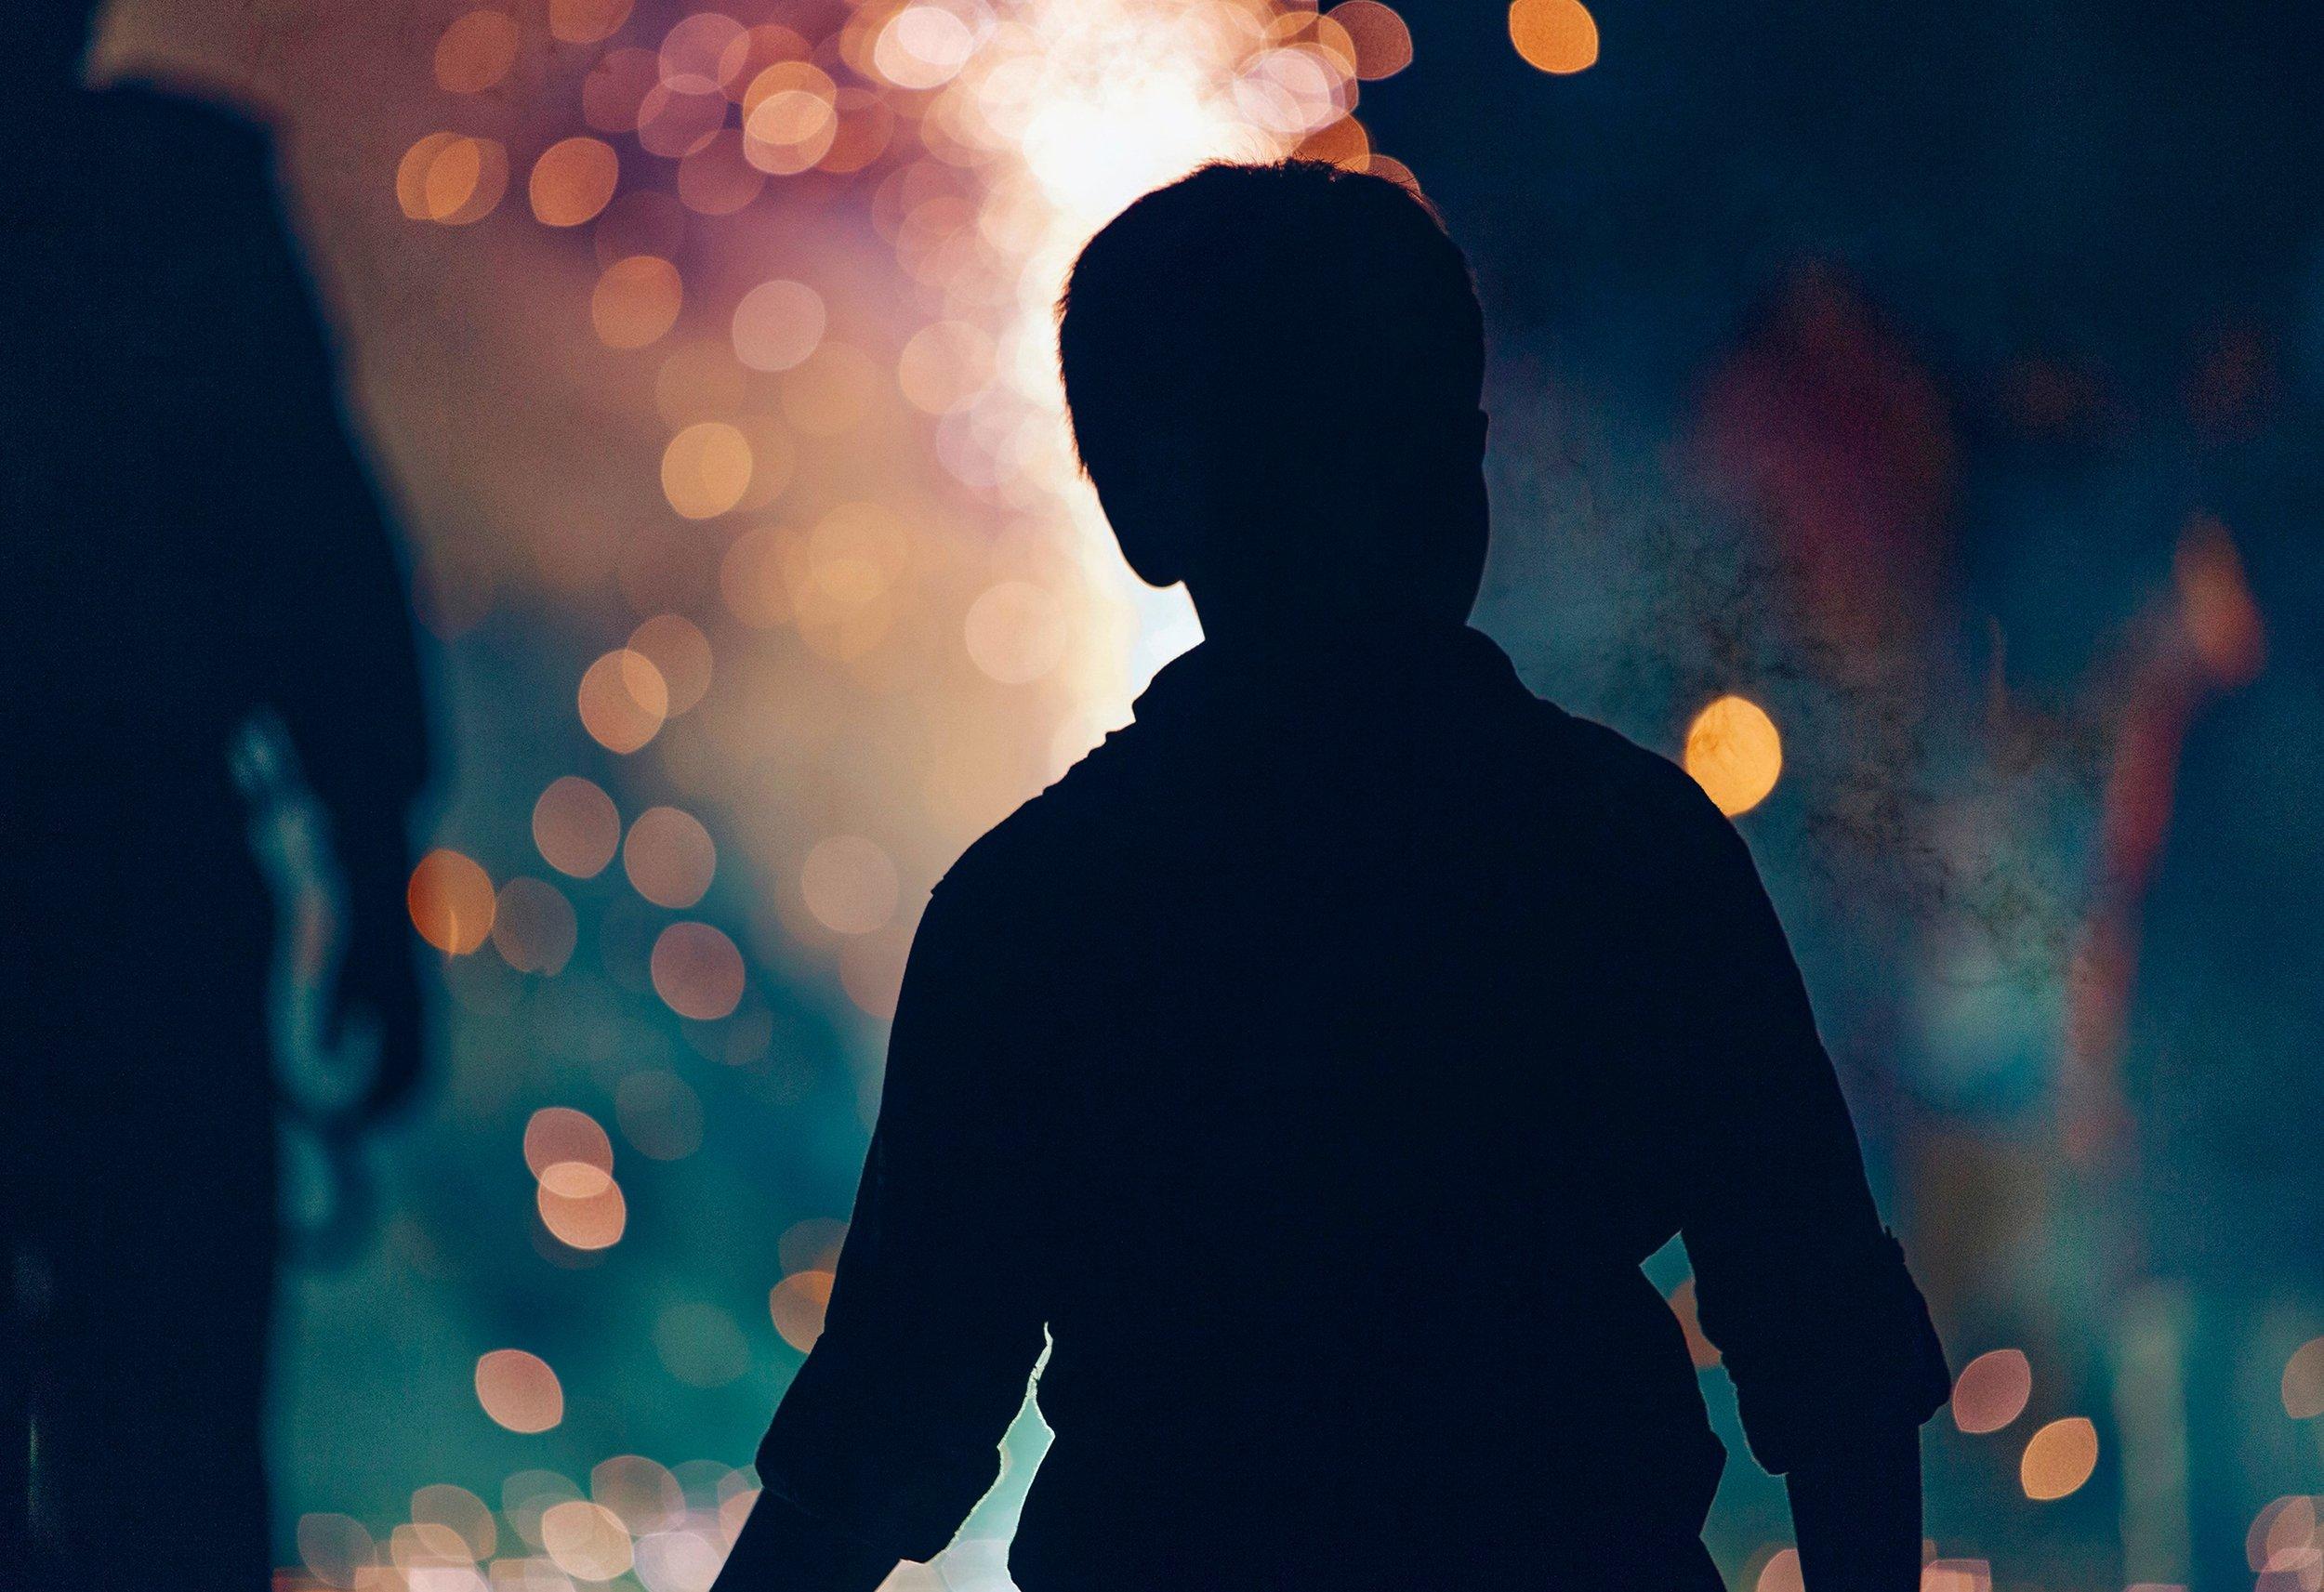 silhouette-light-people-night-boy-kid-1223854-pxhere.com.jpg